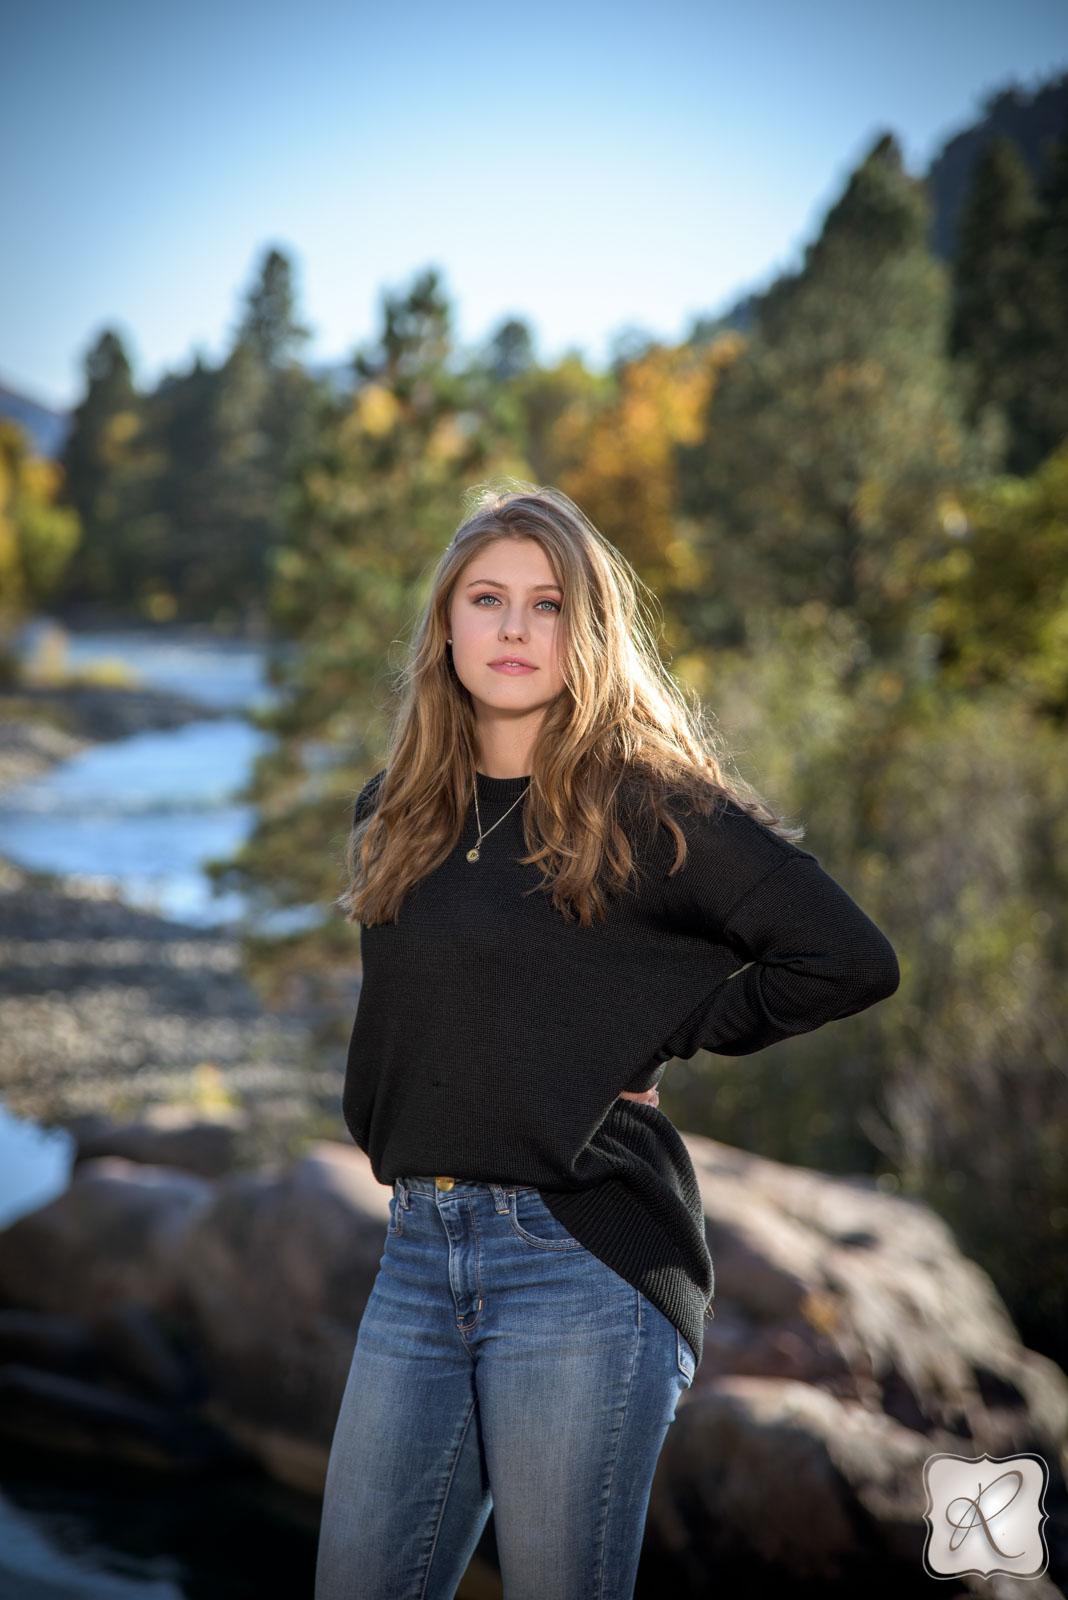 Brooke Mazur U0026 39 S Senior Portraits In Durango  Colorado